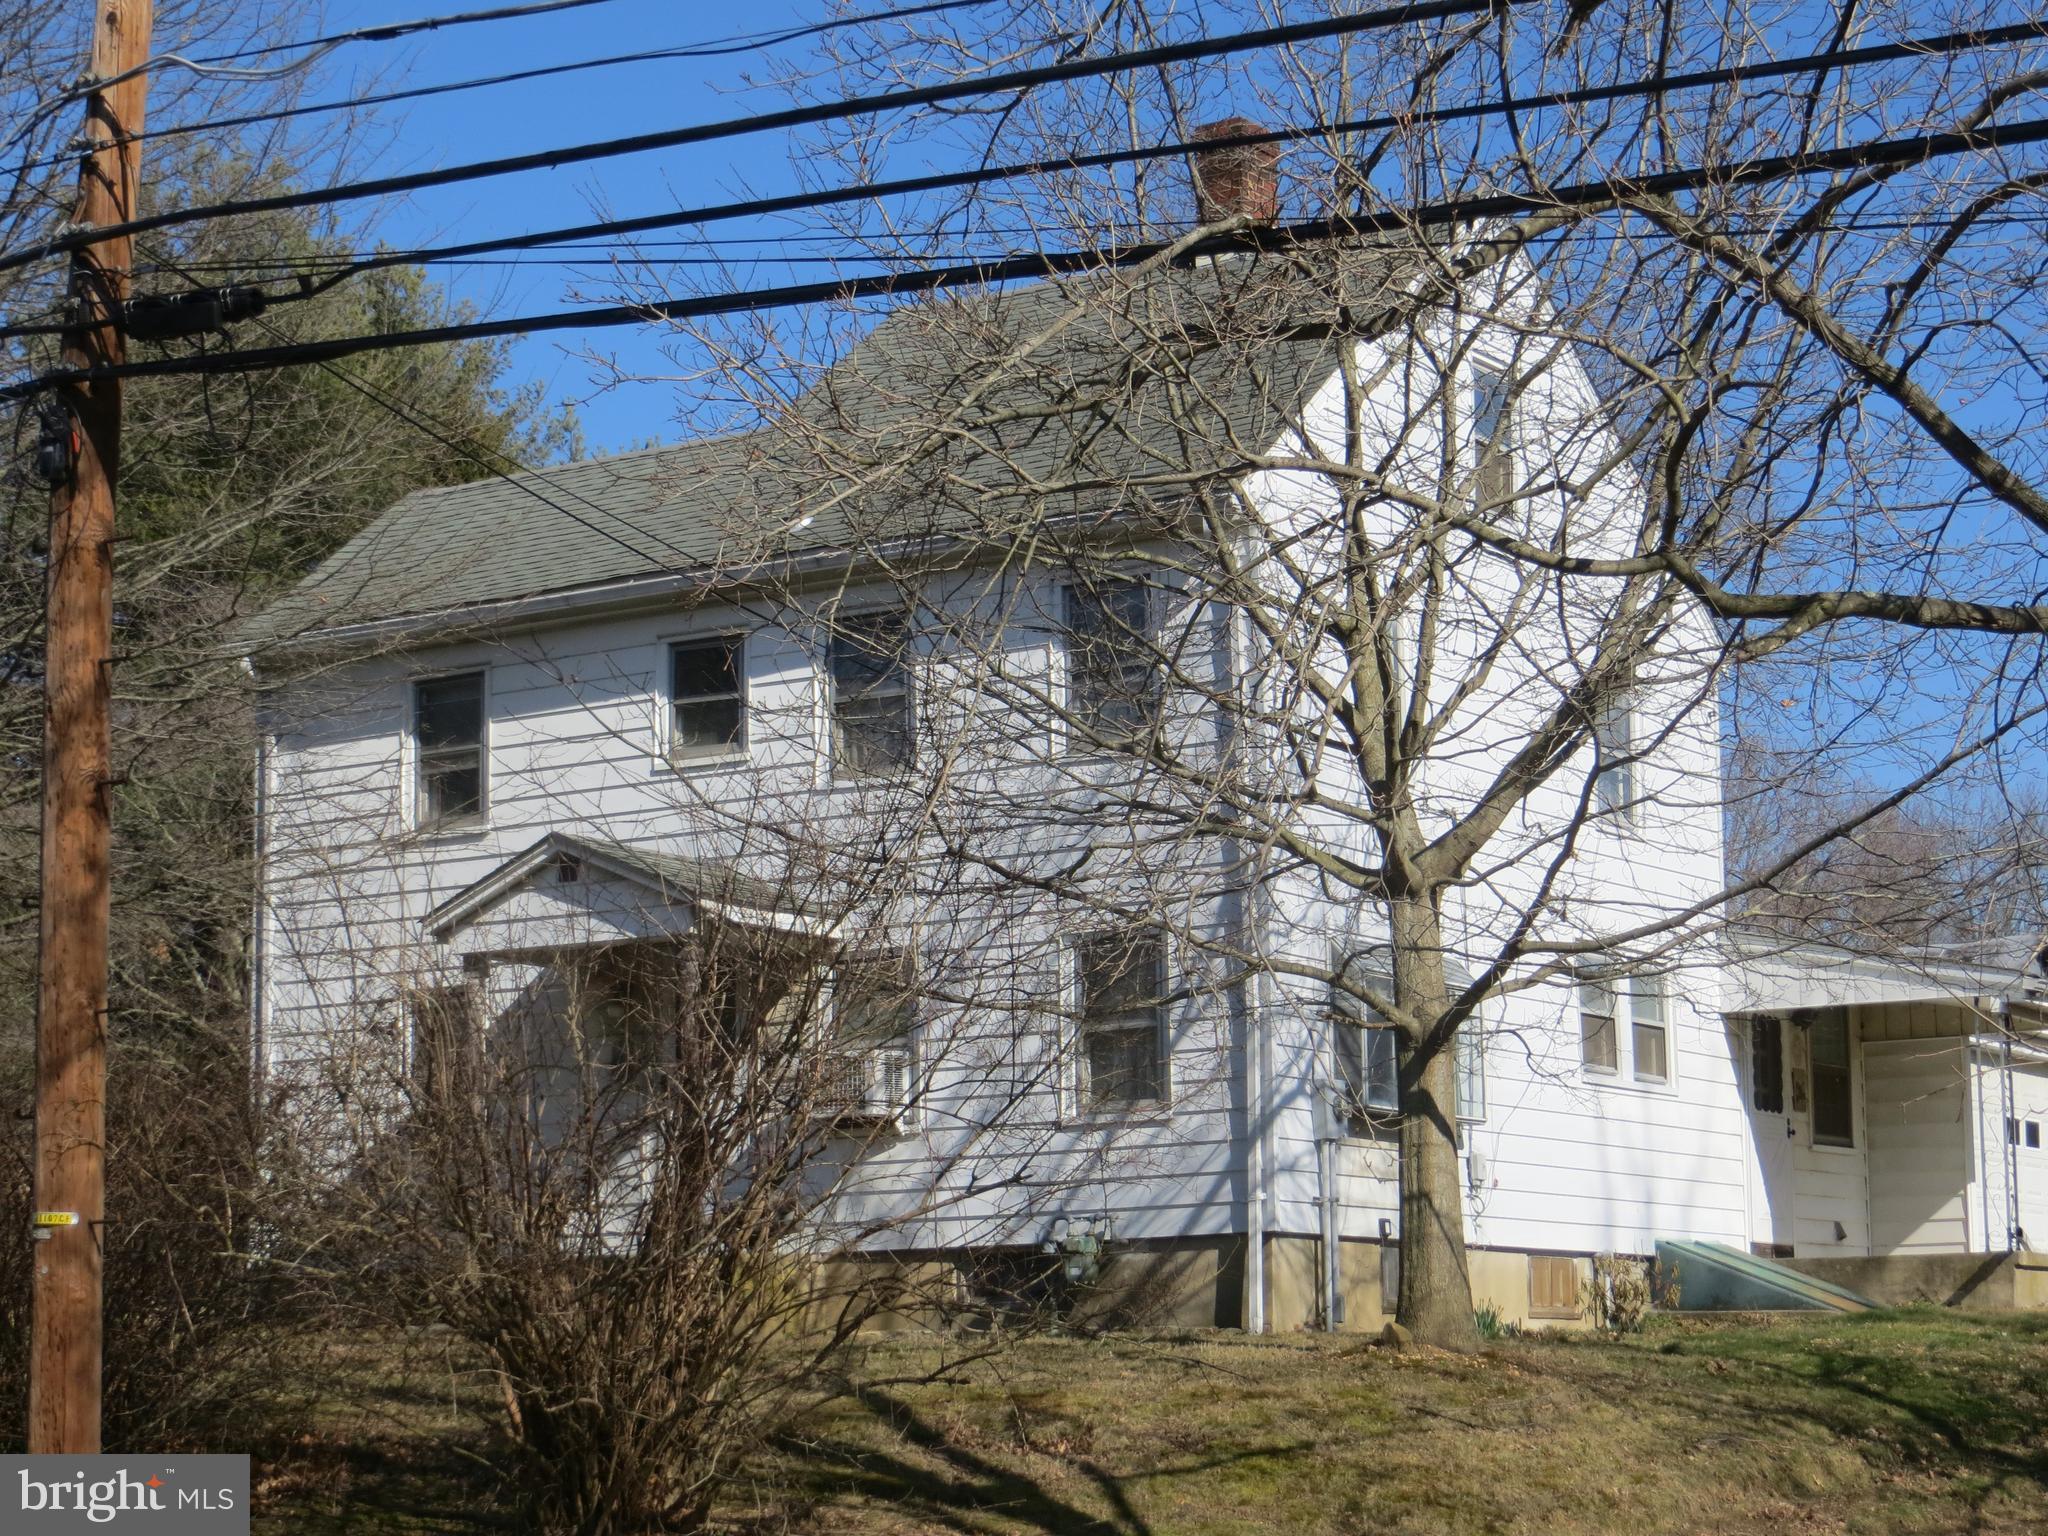 29 CHESTERFIELD CROSSWICKS ROAD, CHESTERFIELD, NJ 08515